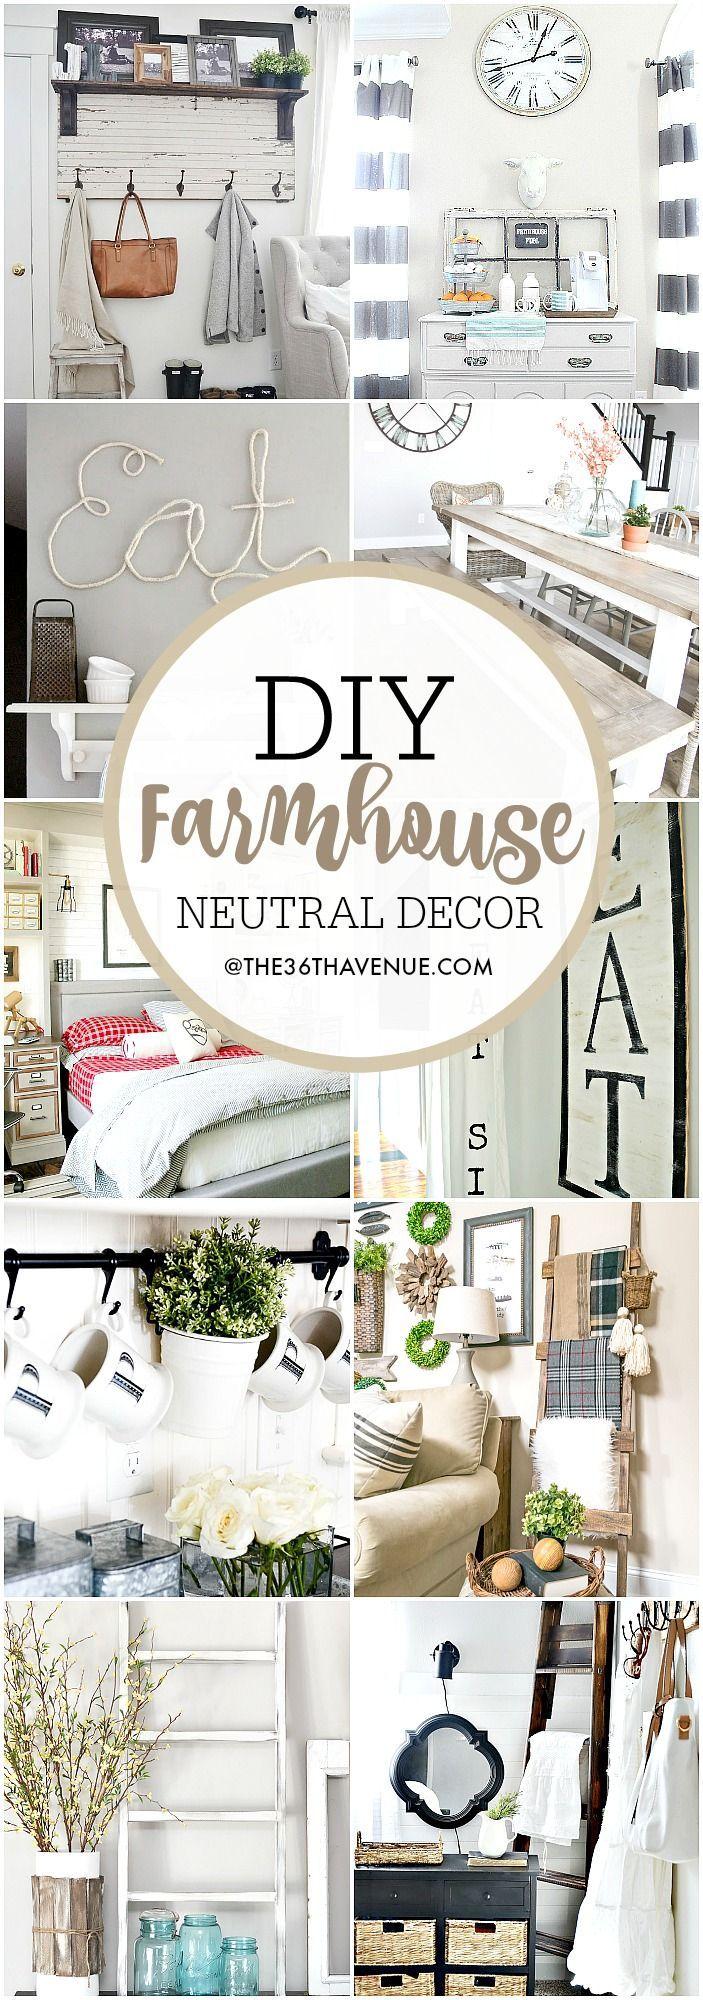 Farmhouse Diy Decor Ideas Over 100 Diy Farmhouse Home Decor Ideas That Are Perfect To